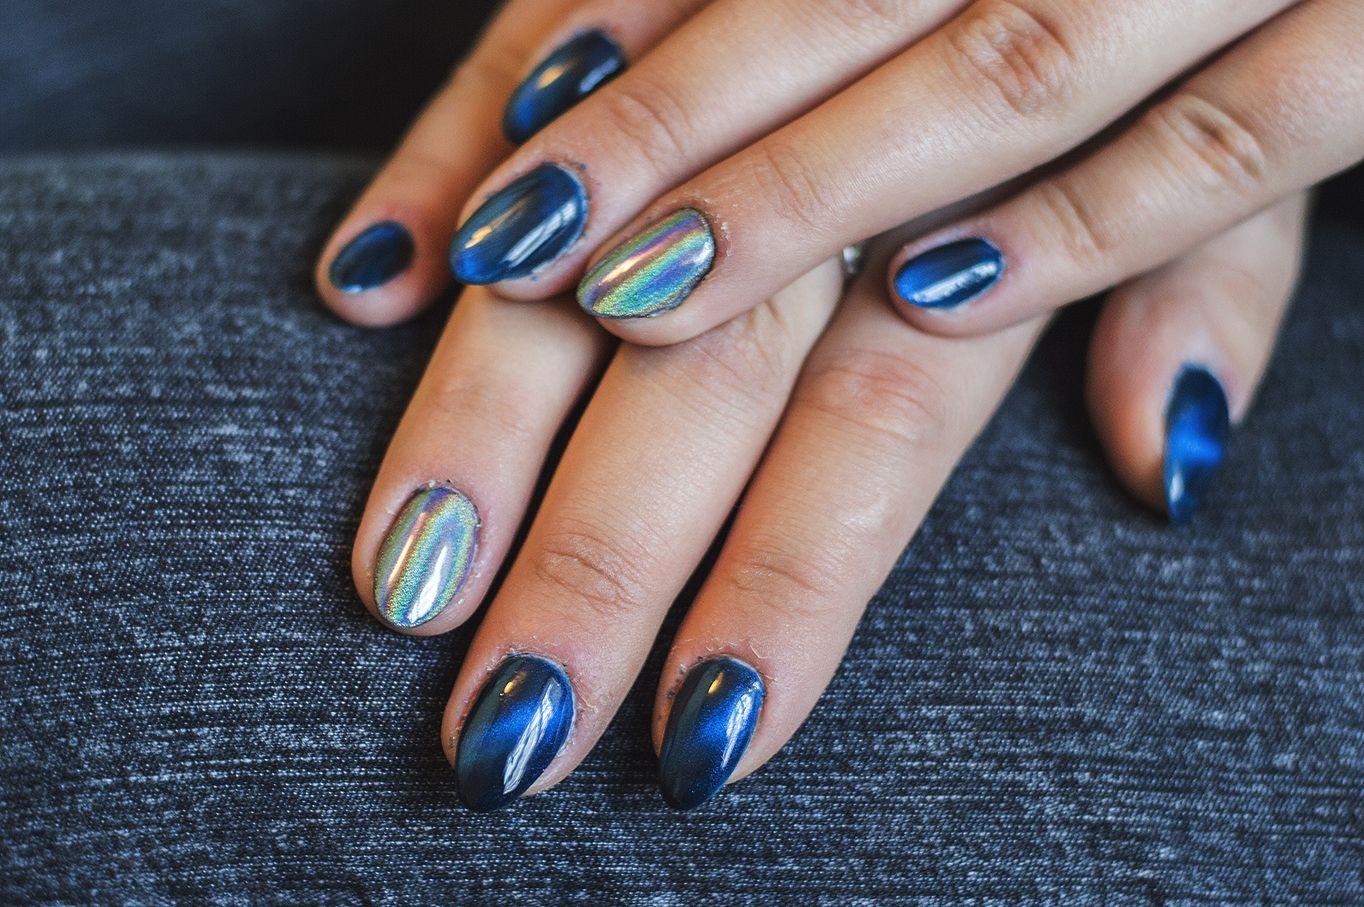 NeoNail ragamuffin cat eye hybrid nails Neonail 3D holo effect